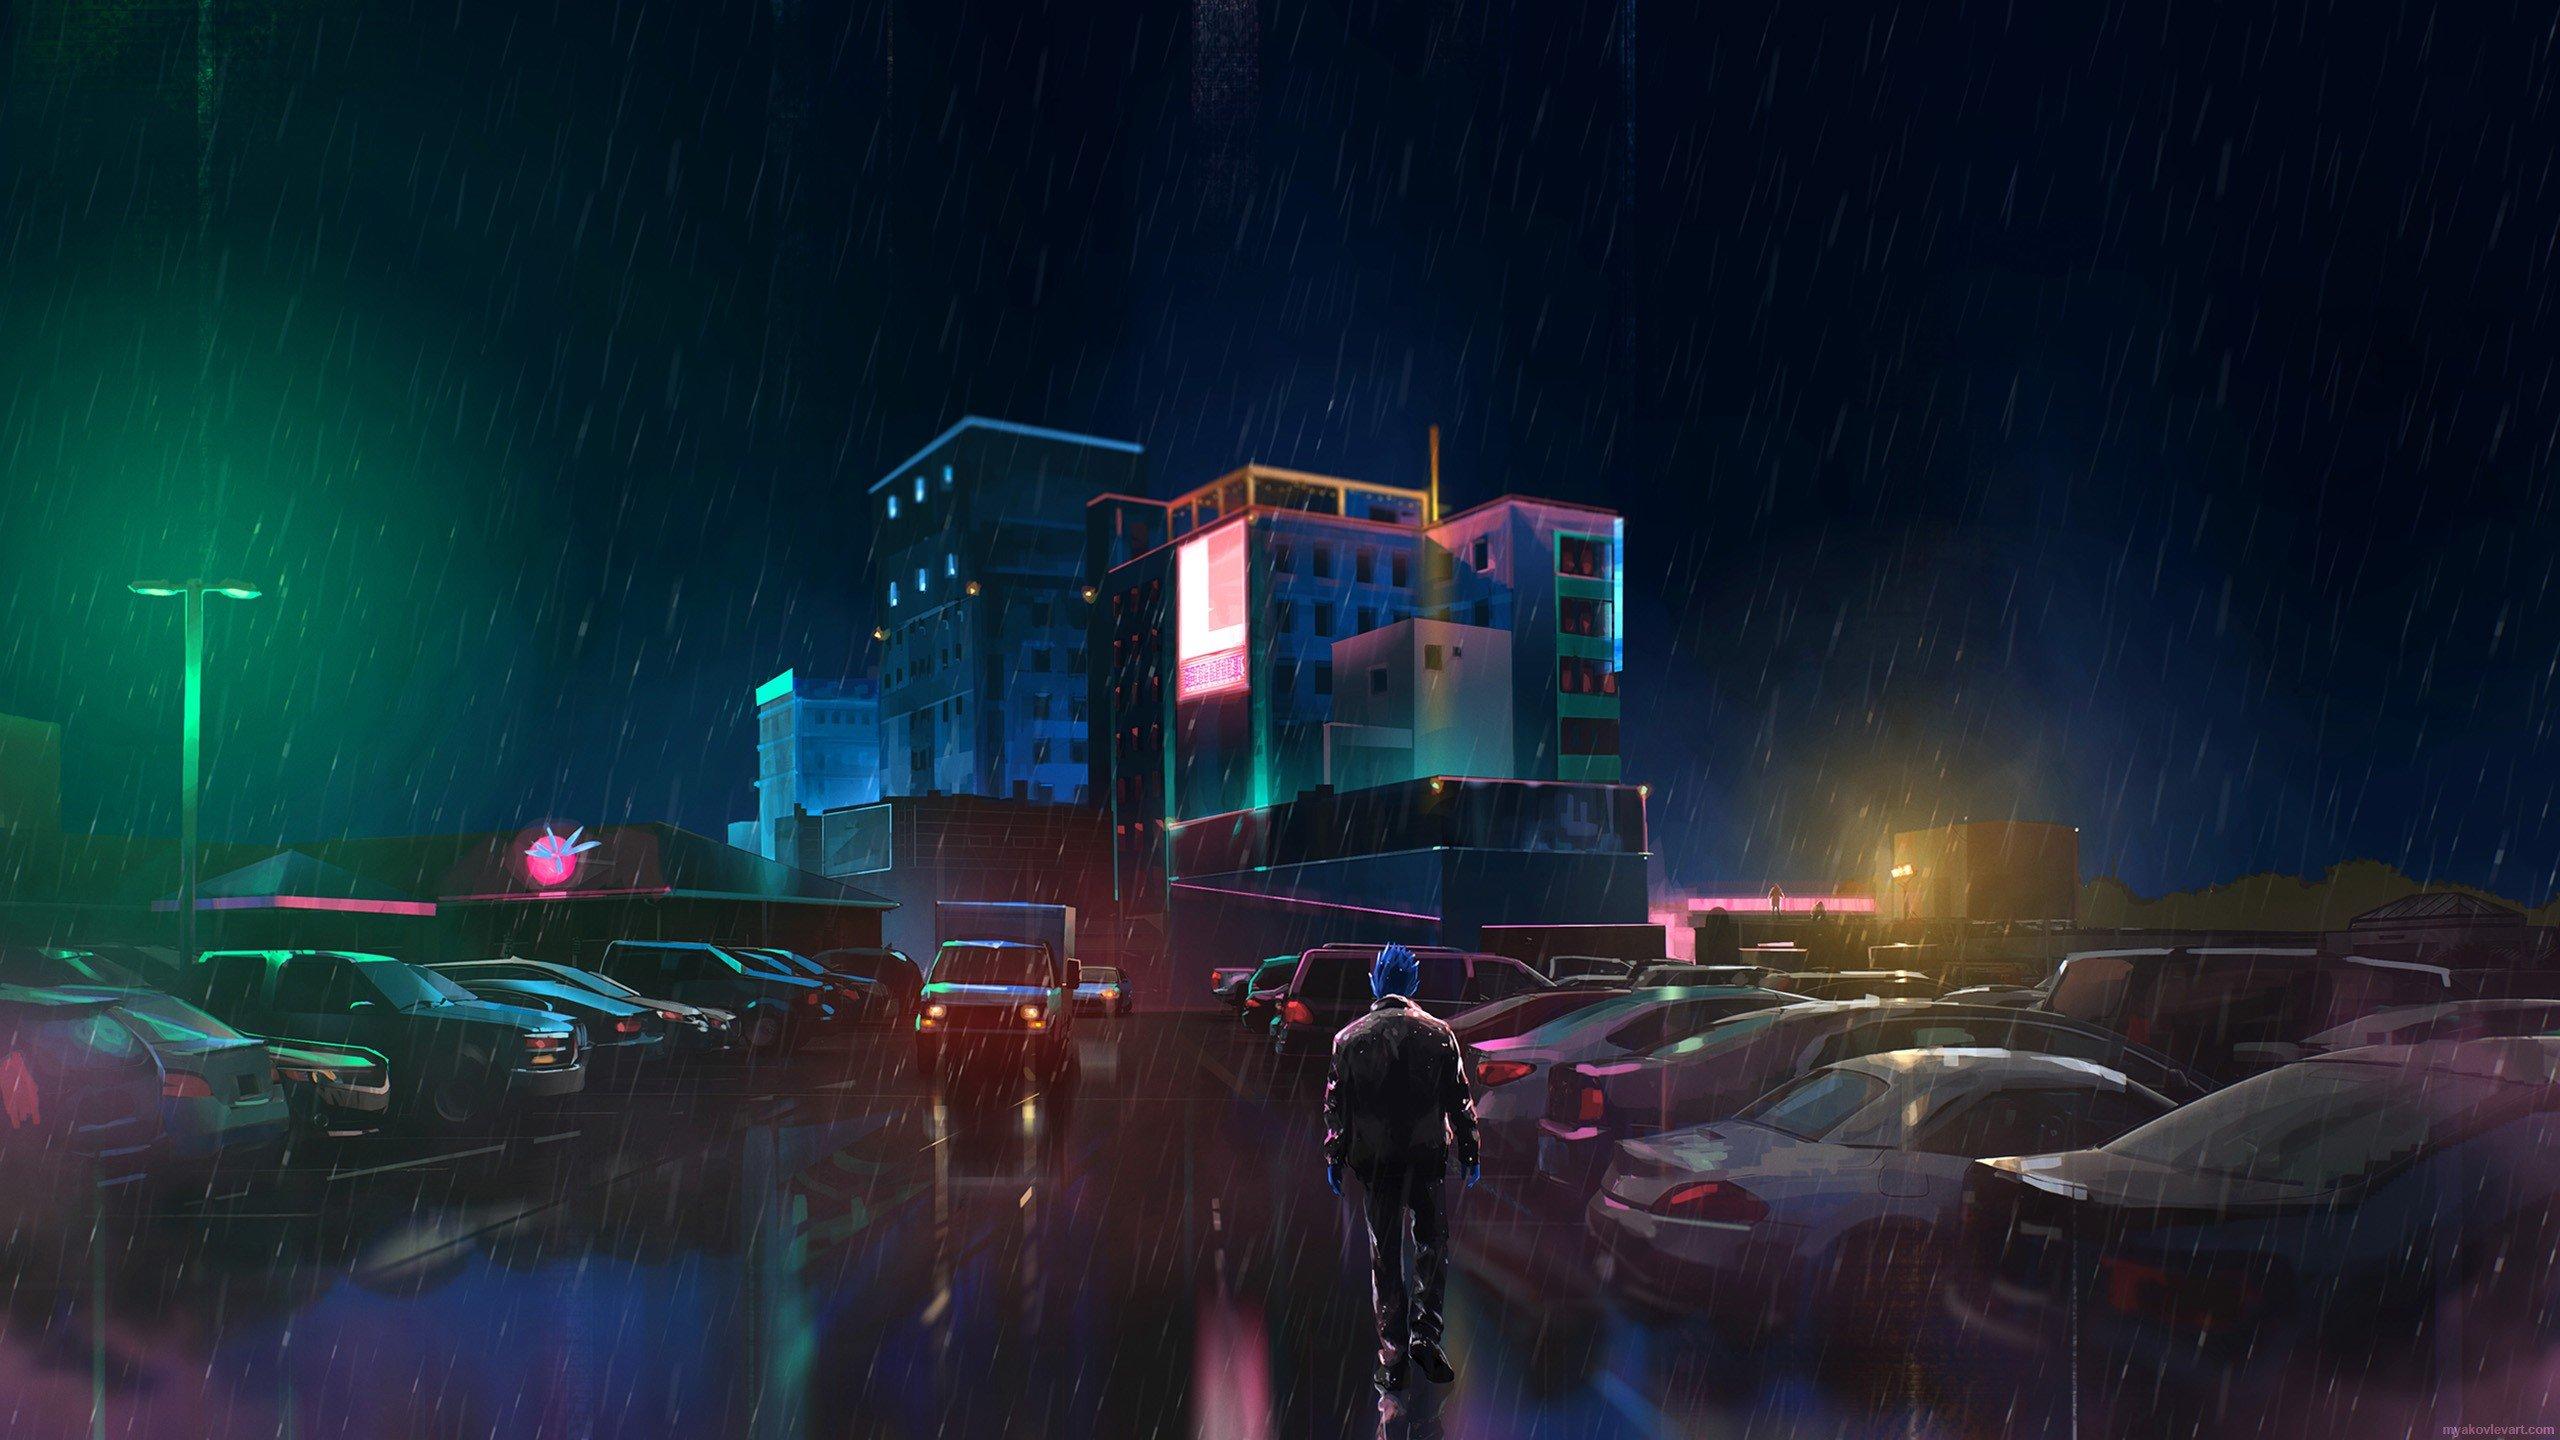 Rain neon digital art hd wallpapers desktop and mobile - Neon hd wallpaper for mobile ...